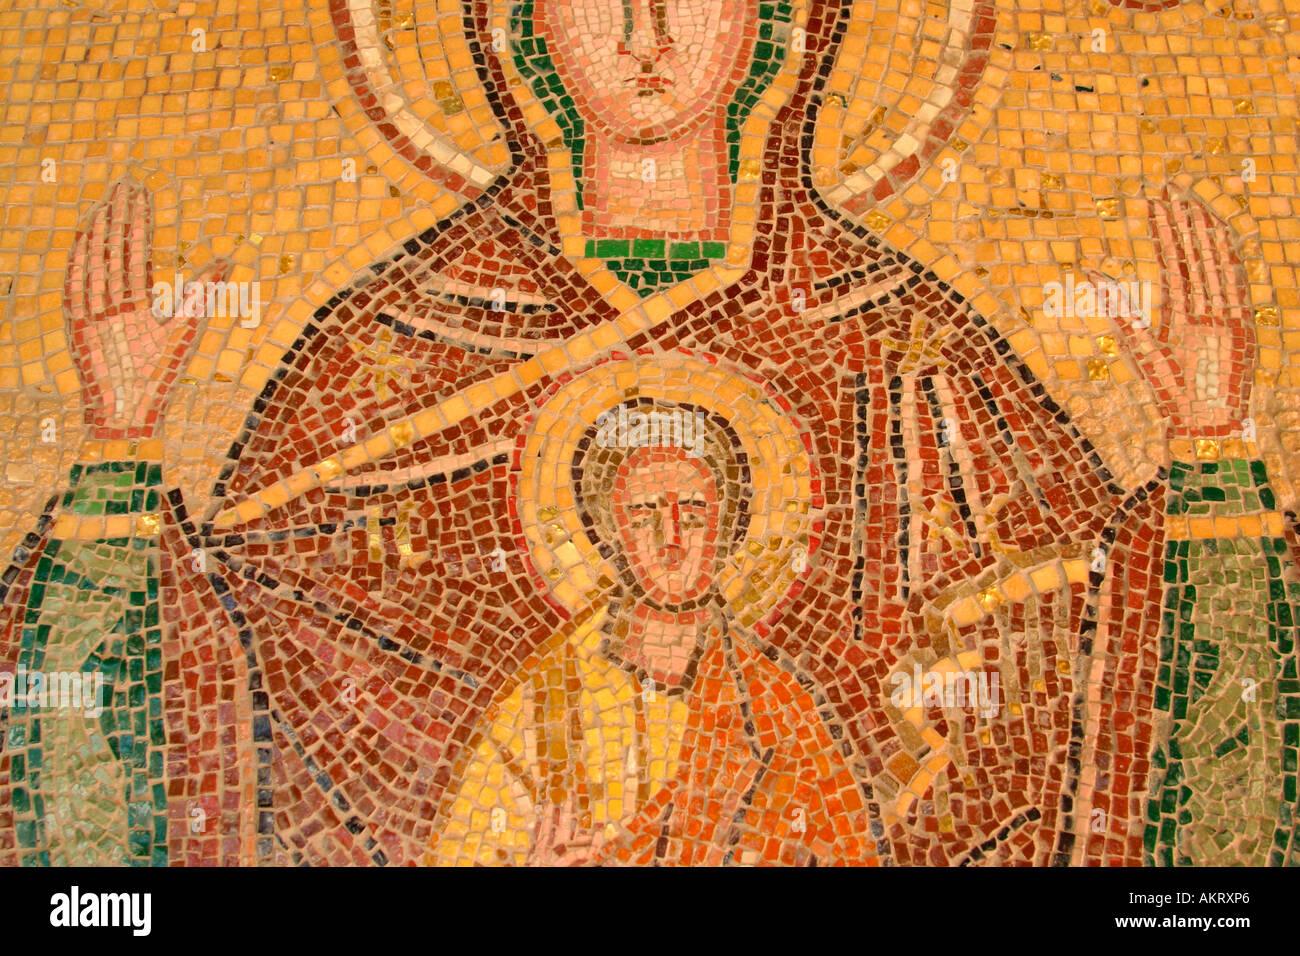 A mosaic at the Filerimos acropolis, Rhodes - Stock Image